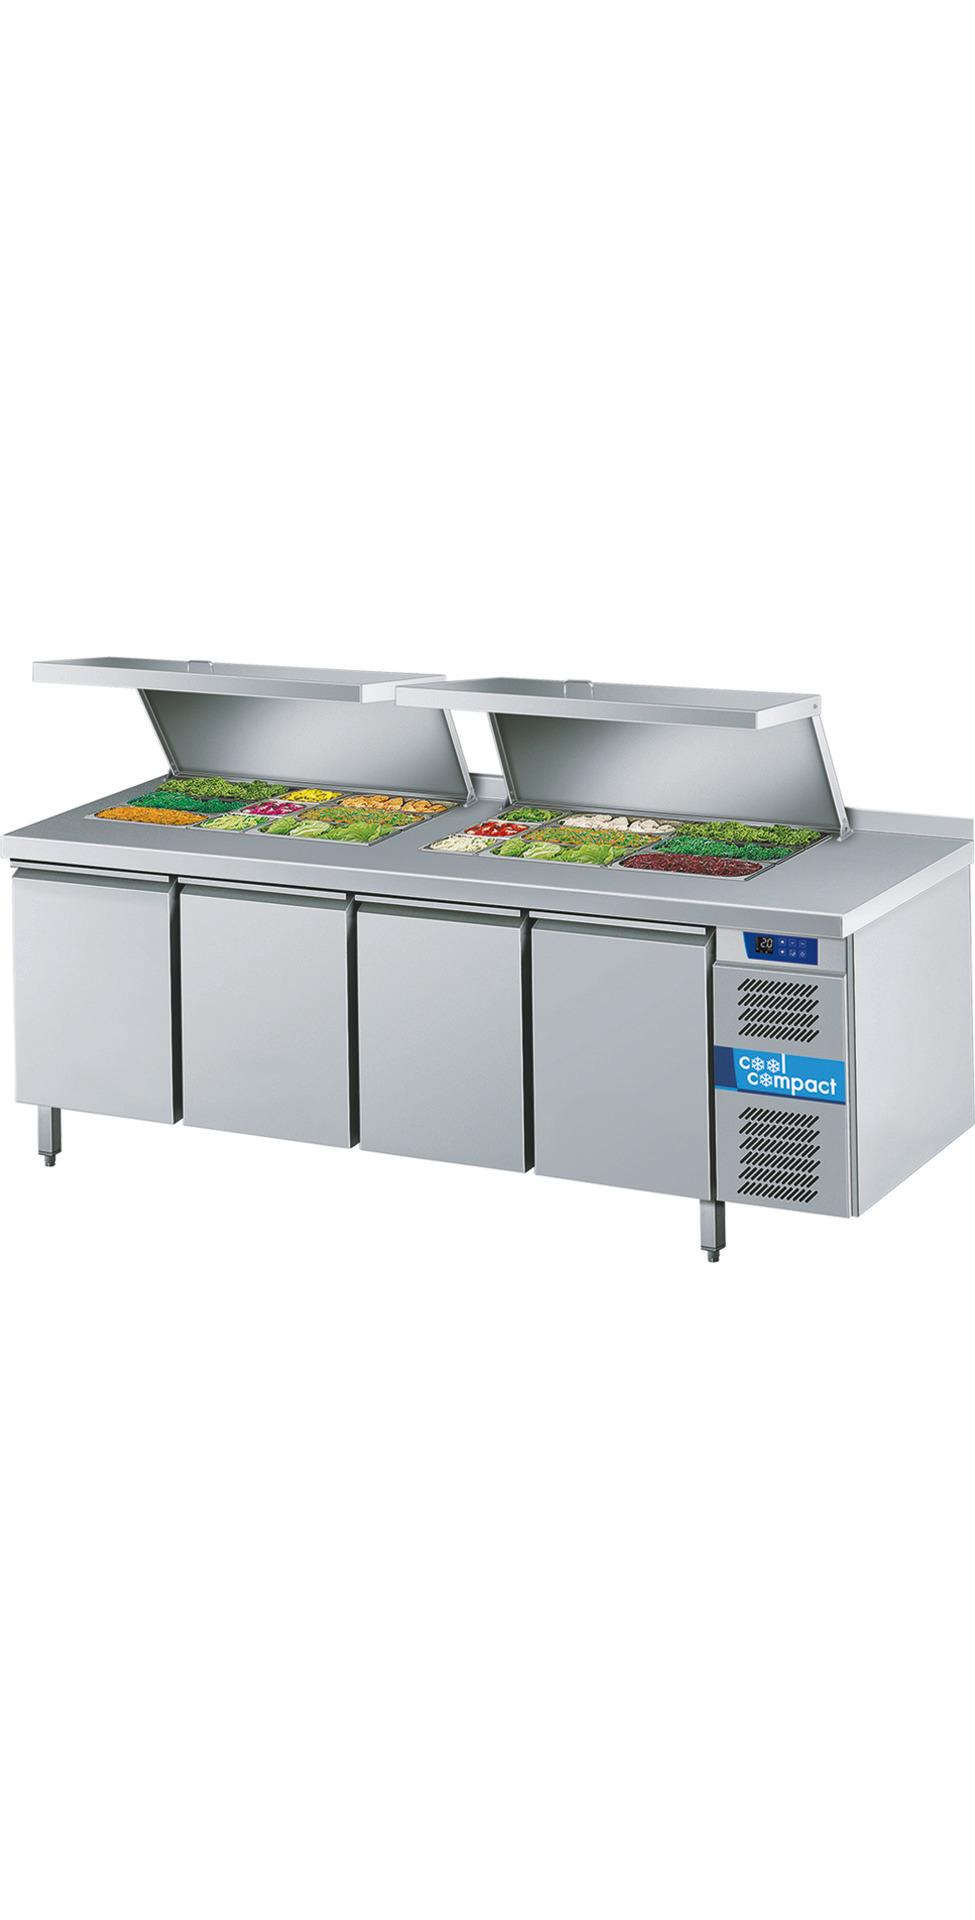 Saladette 4 Türen je 8 x GN 1/1 /  ohne Tischplatte / zentralgekühlt